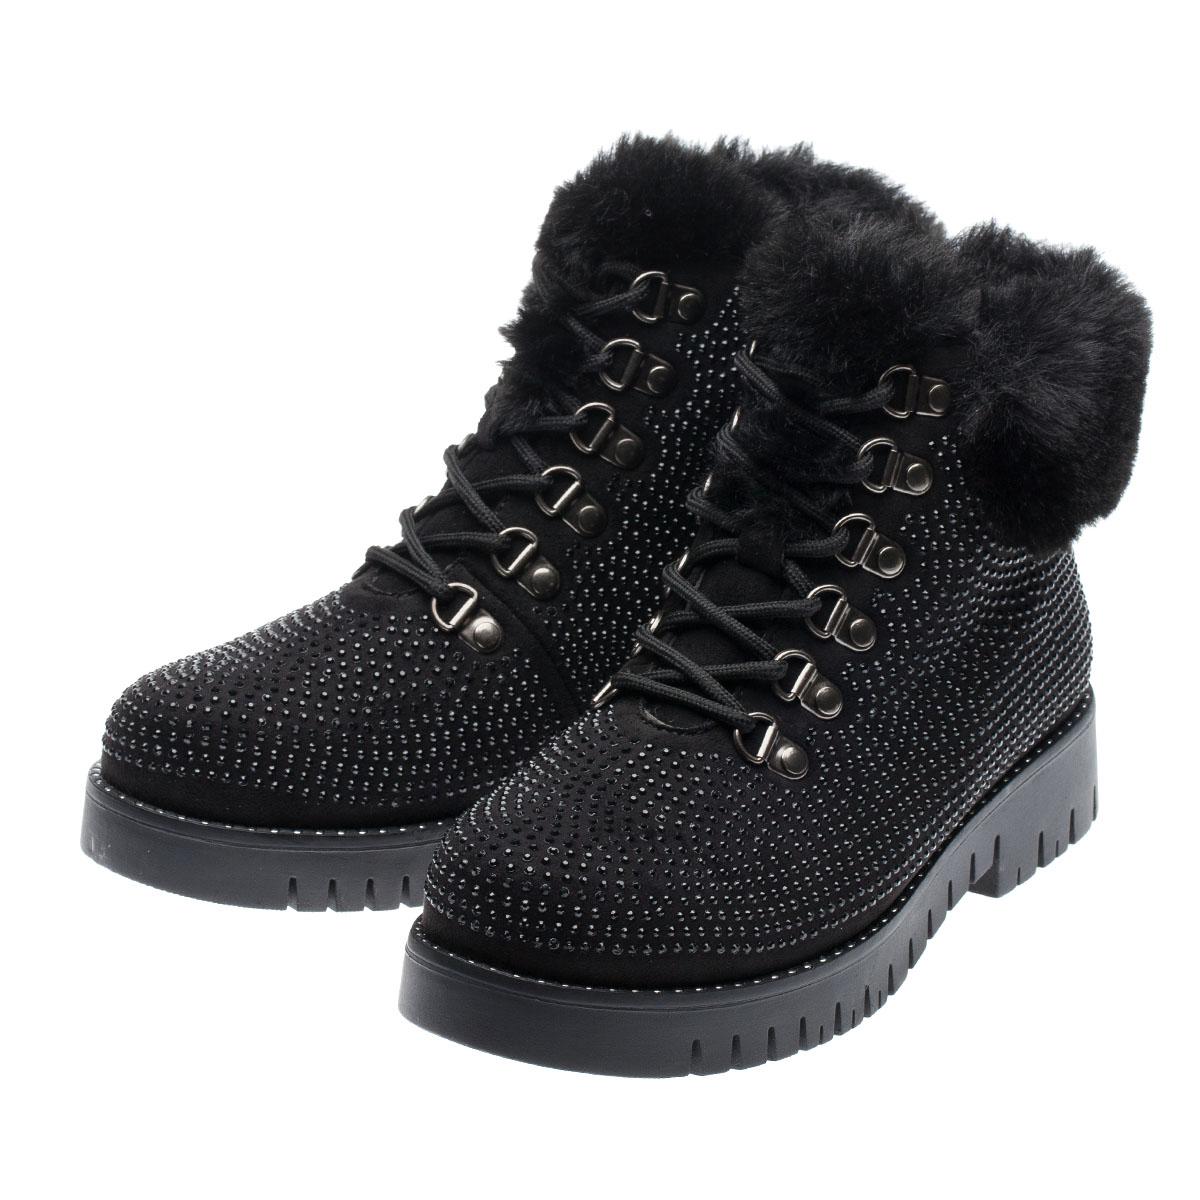 Ботинки зимние FERTO, F17-6132-1